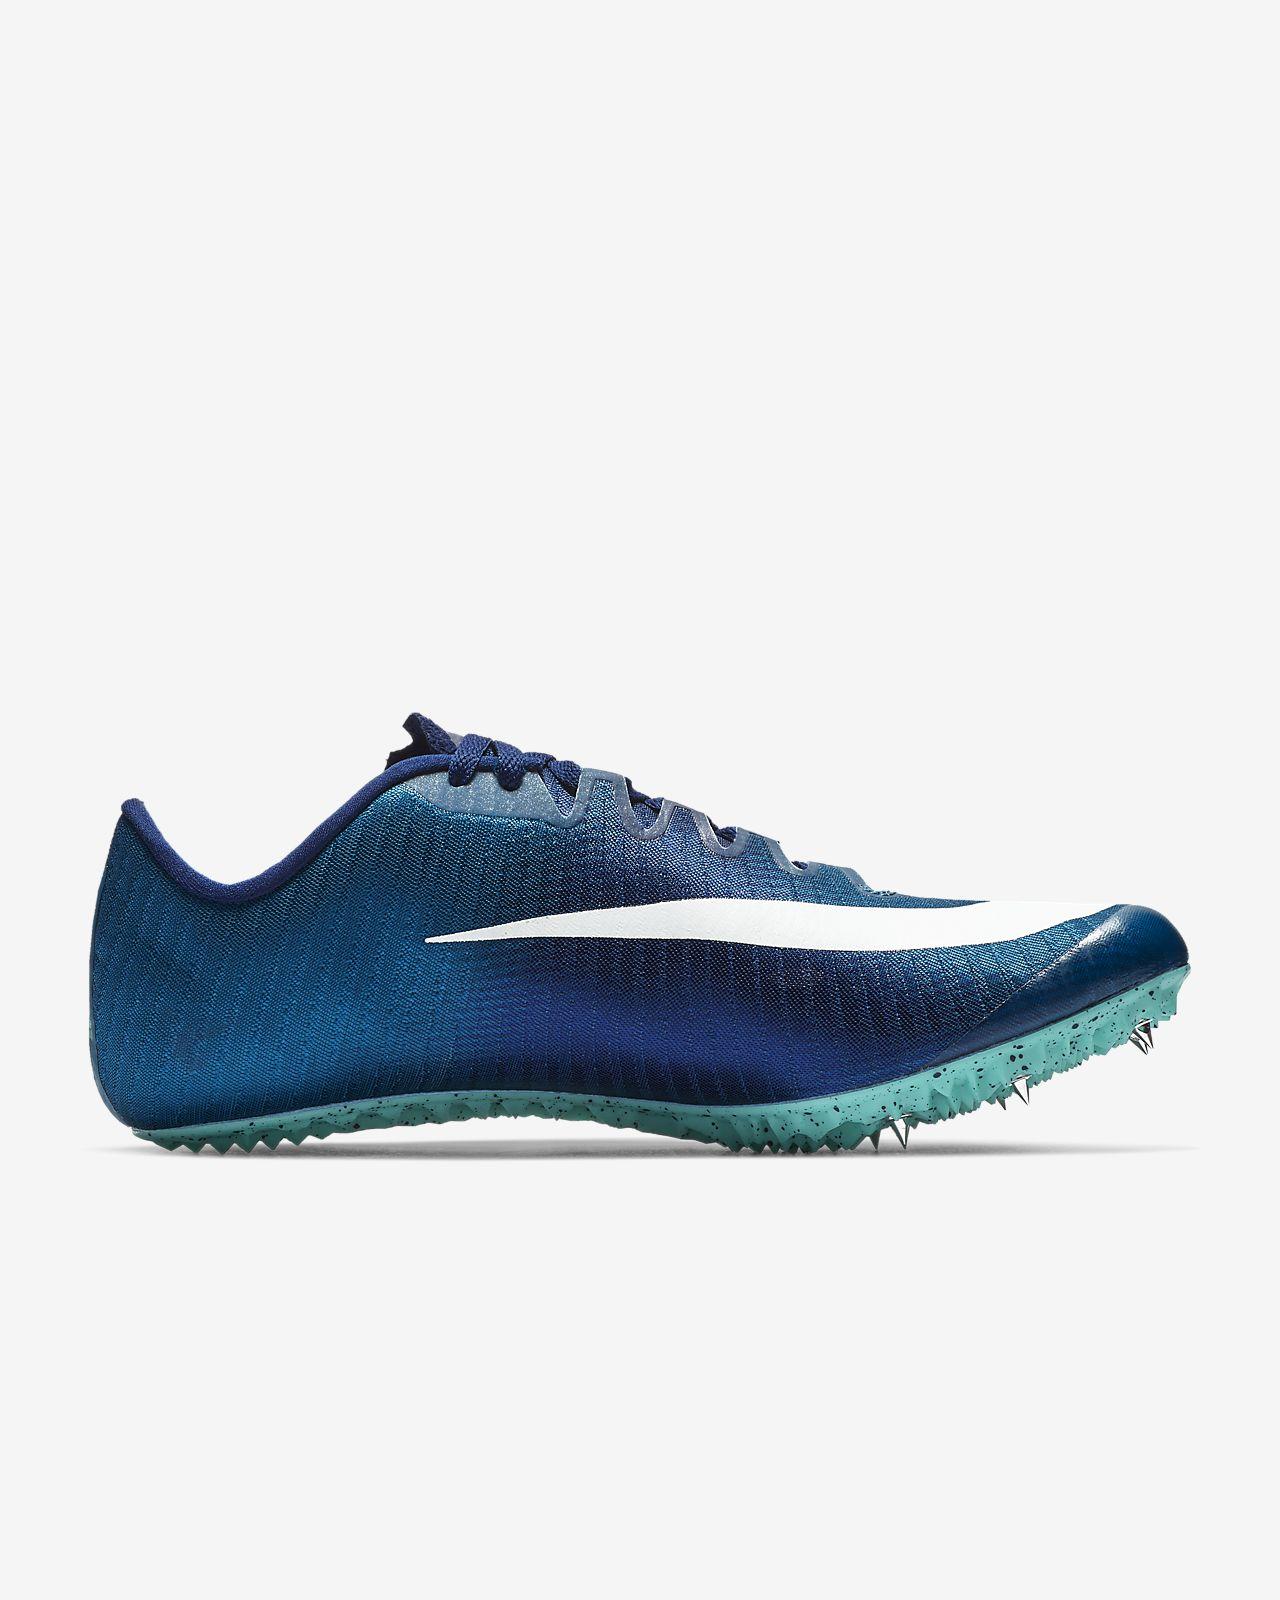 4d55762579b78 Nike Zoom Ja Fly 3 Unisex Track Spike. Nike.com